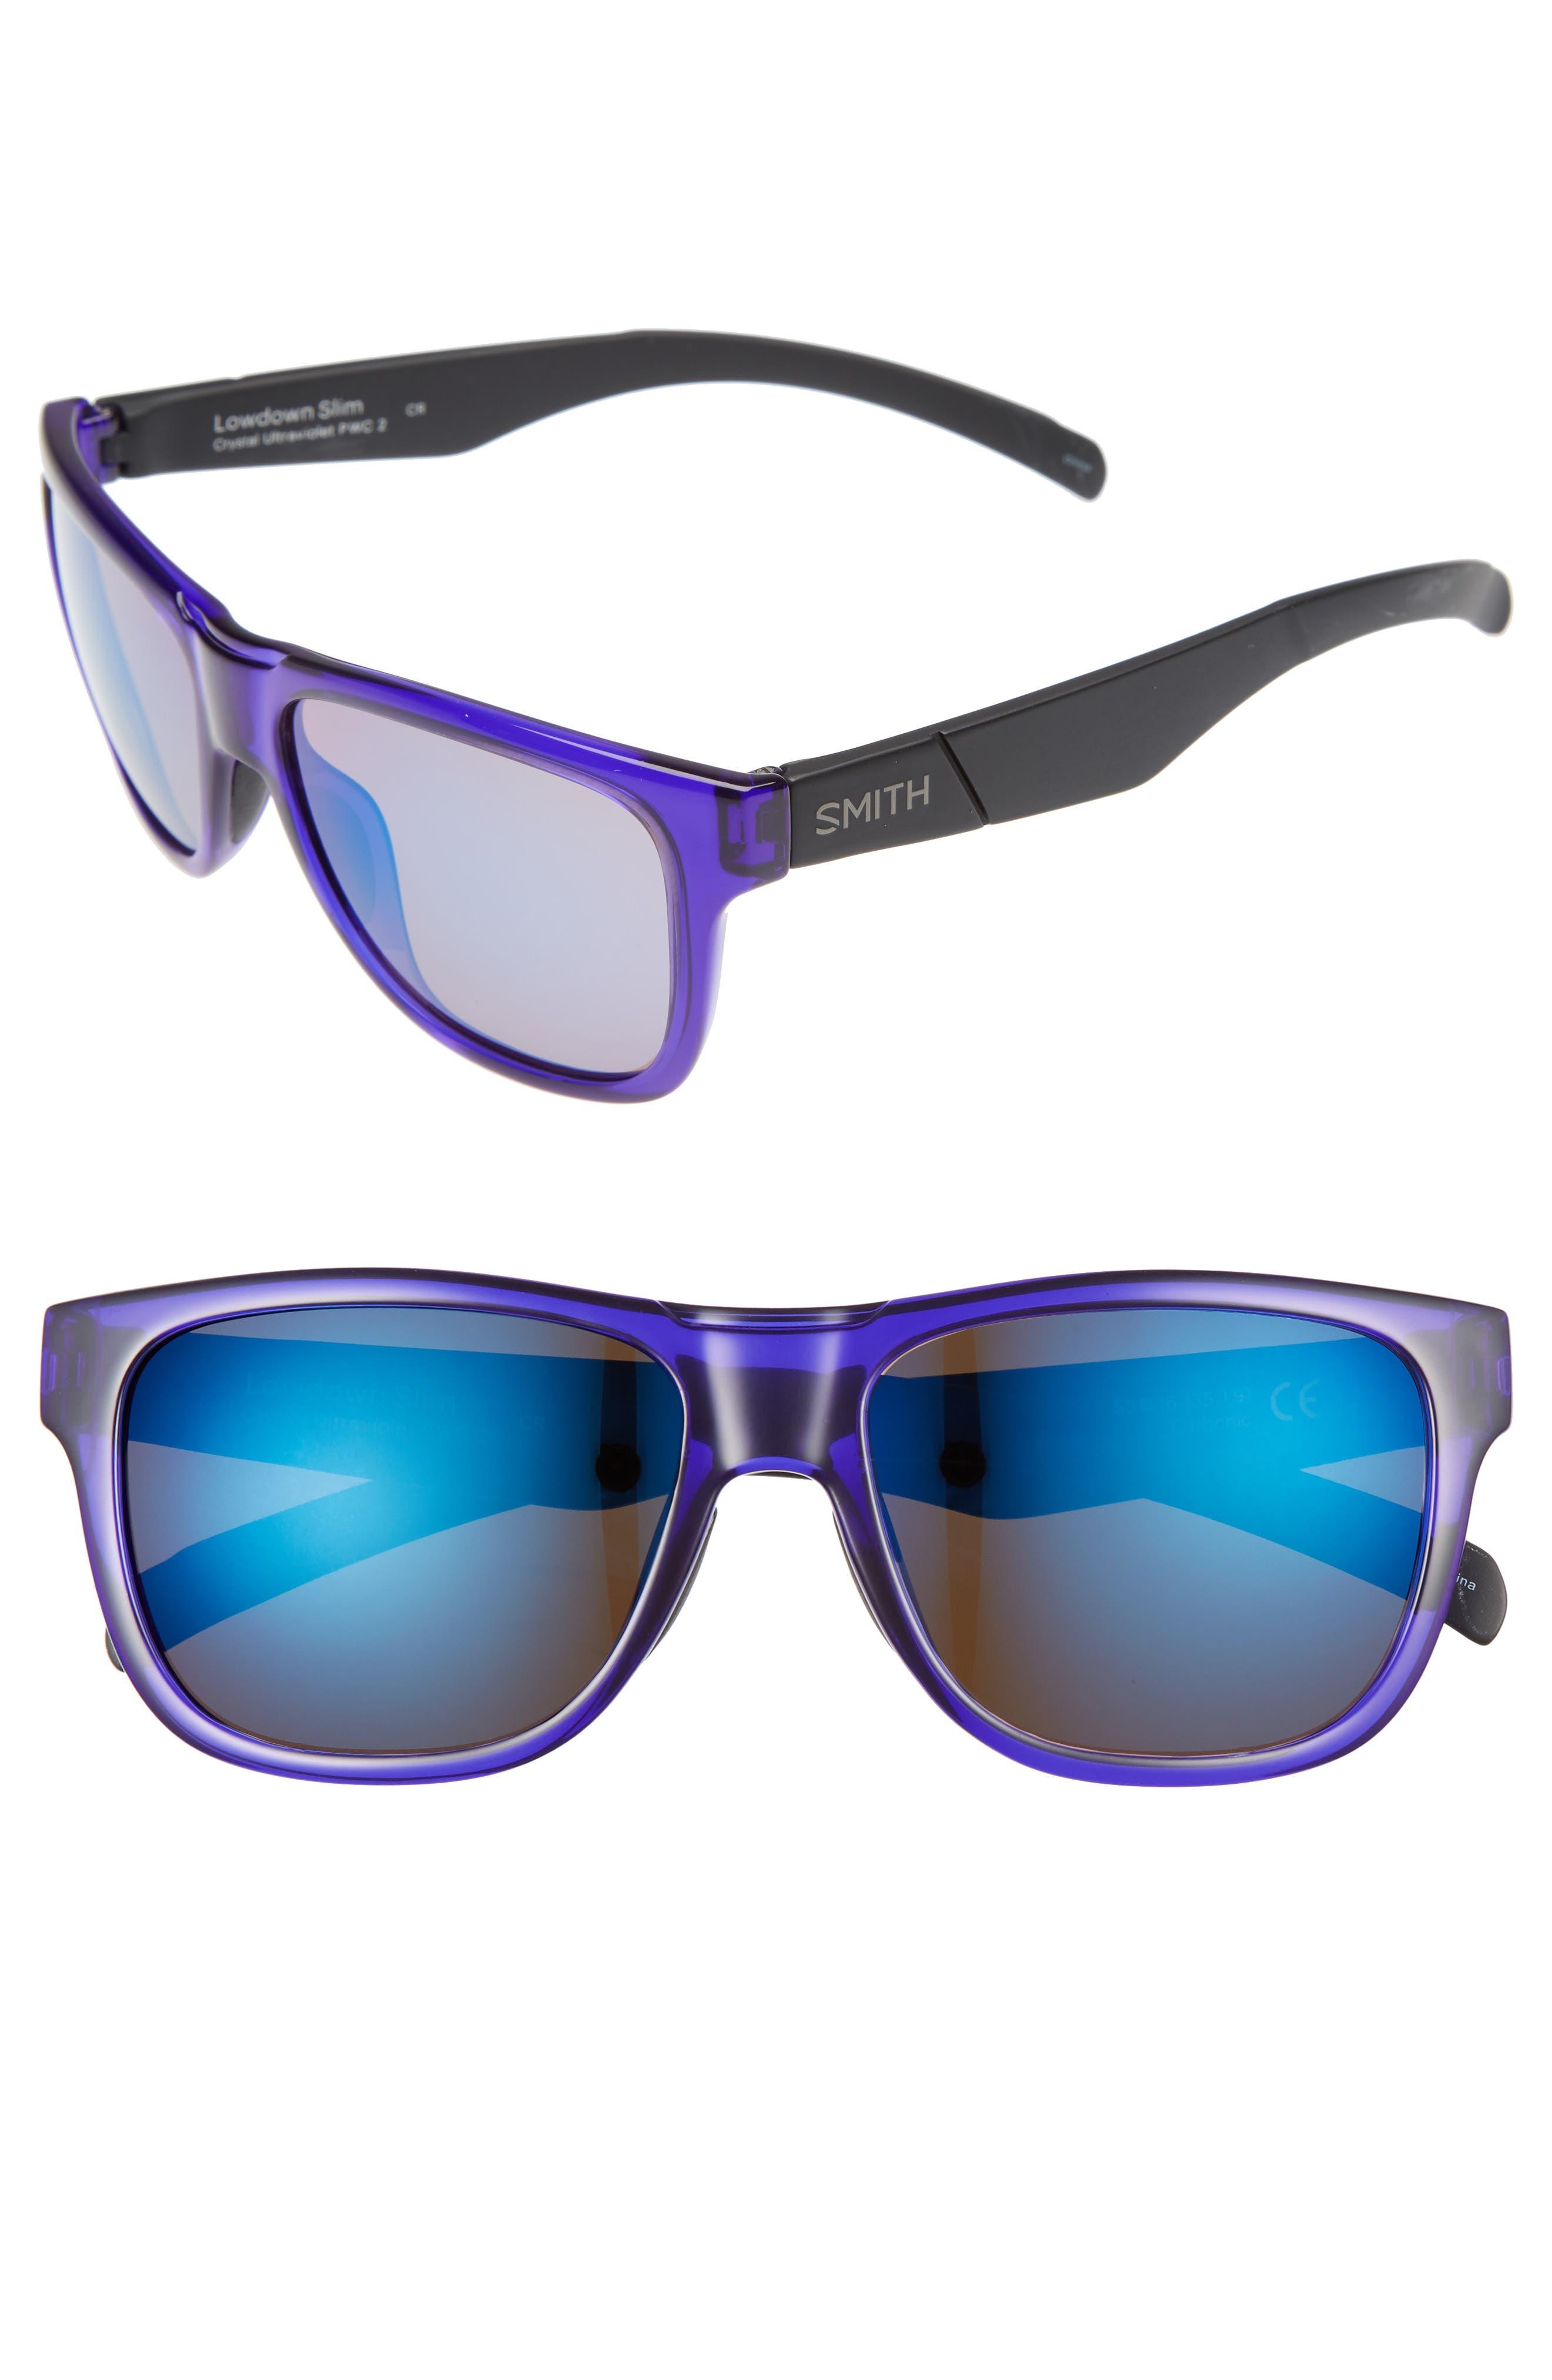 Smith Lowdown Slim 53mm Mirrored Sunglasses